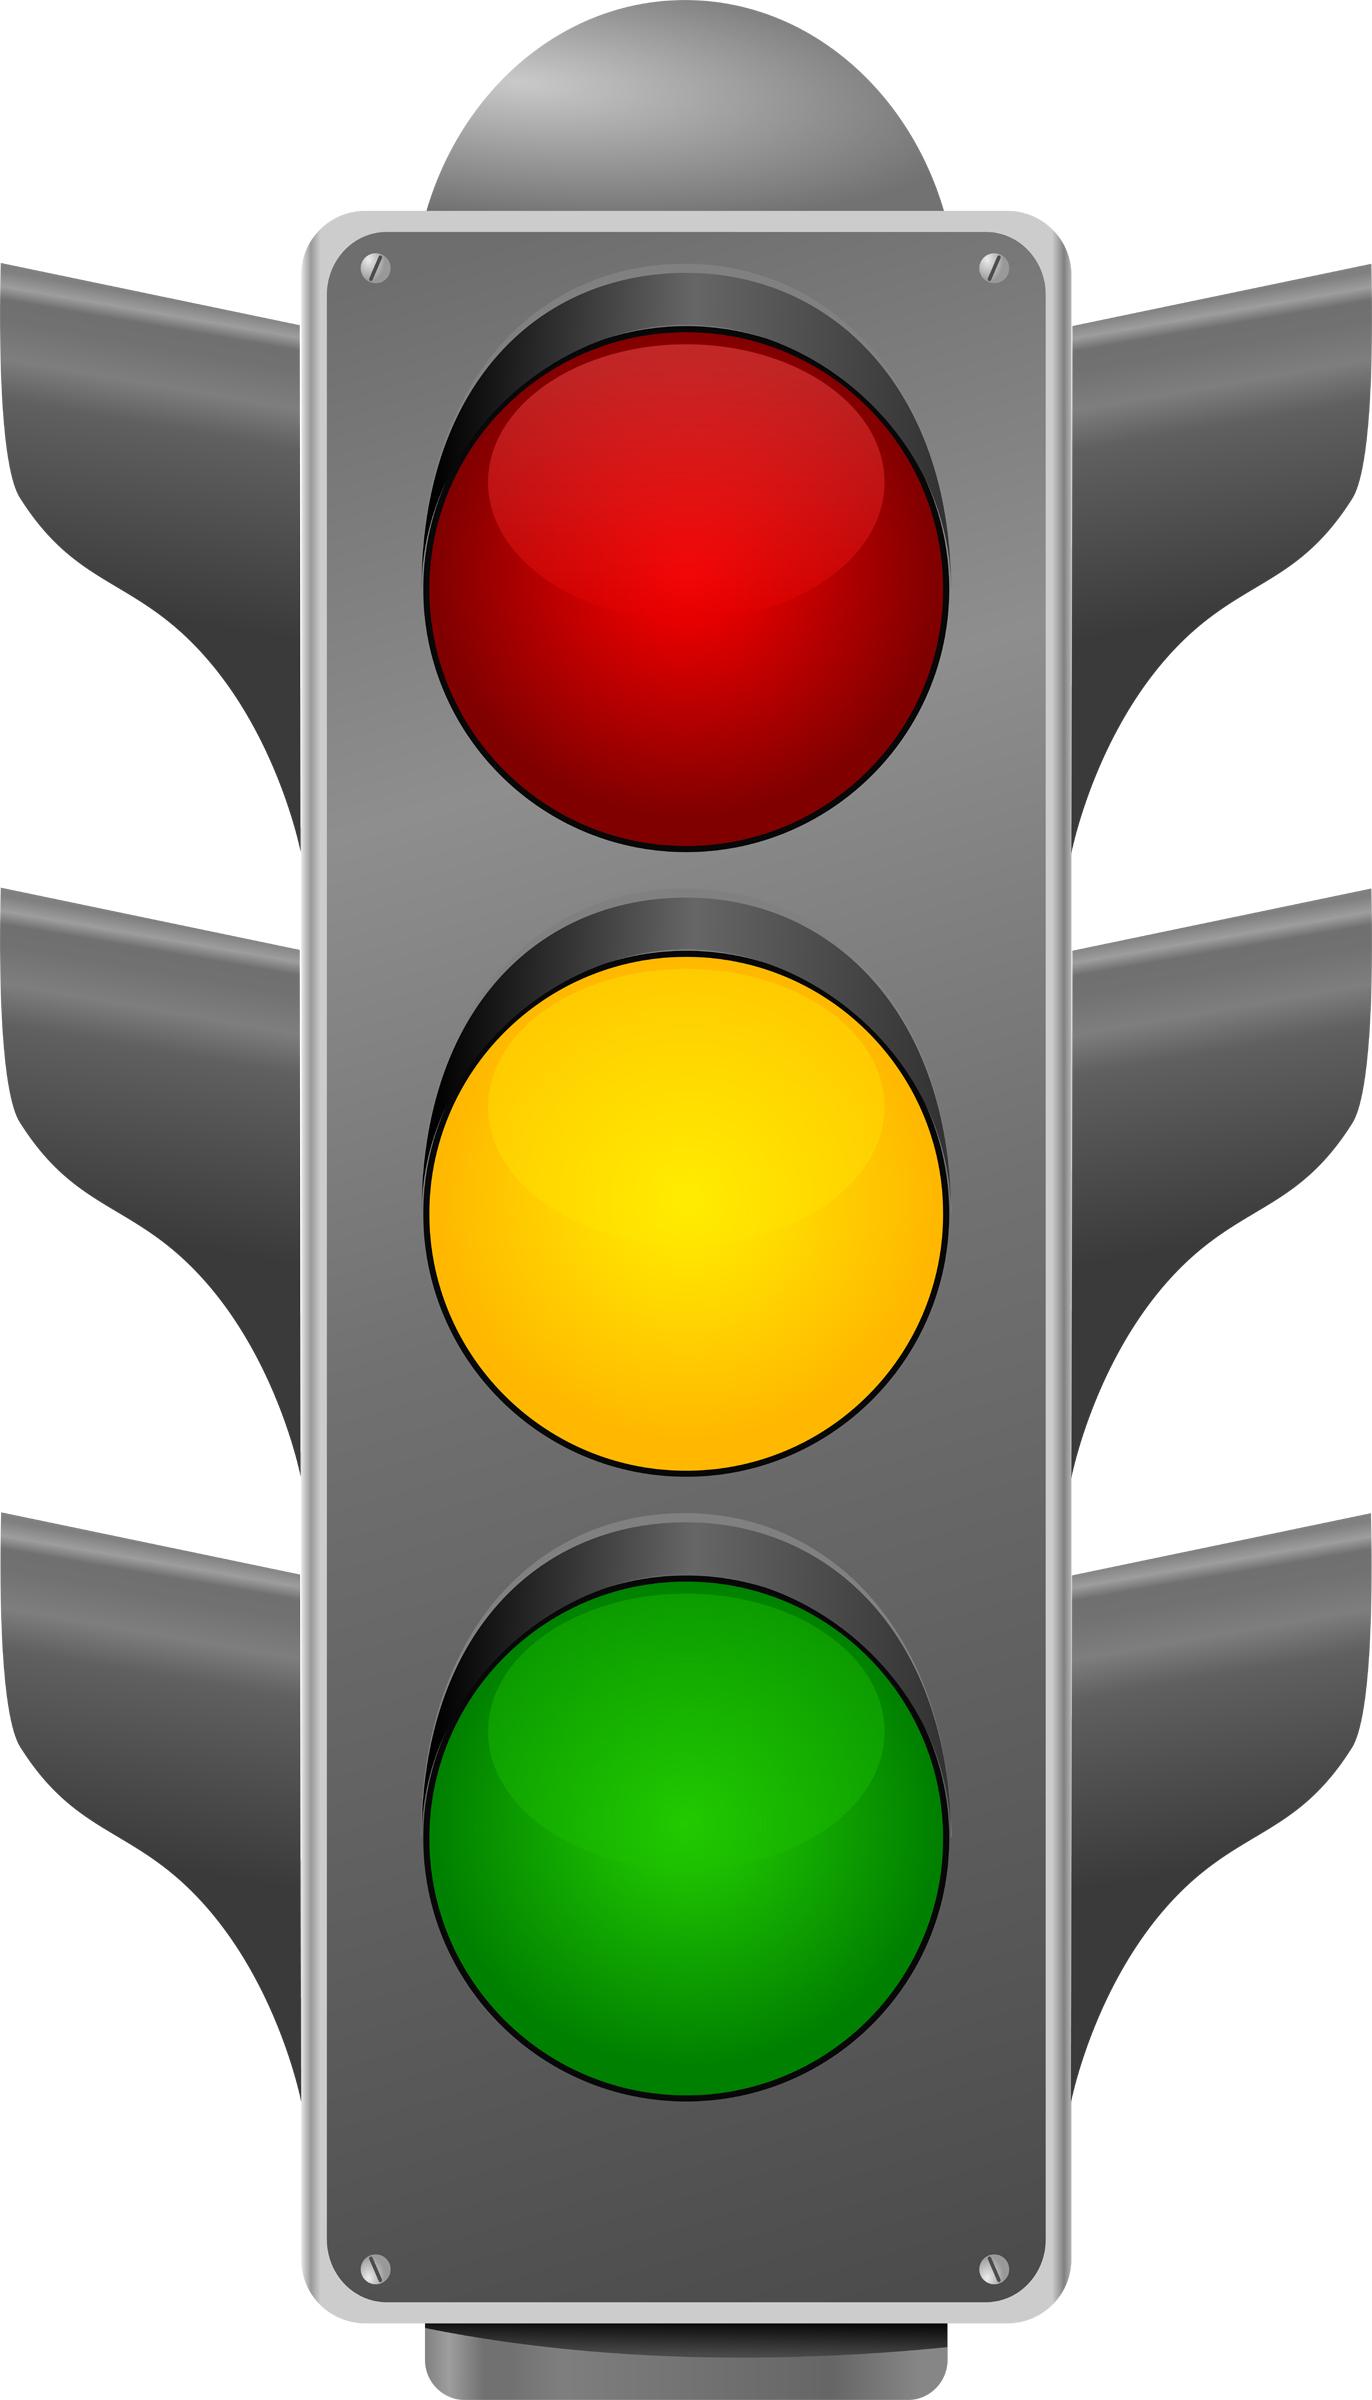 image 5731c73102012199e9025c347dde8f9d resolution 1372x2400 yellow rh objectshowfanonpedia wikia com traffic light clip art black and white traffic light clip art free